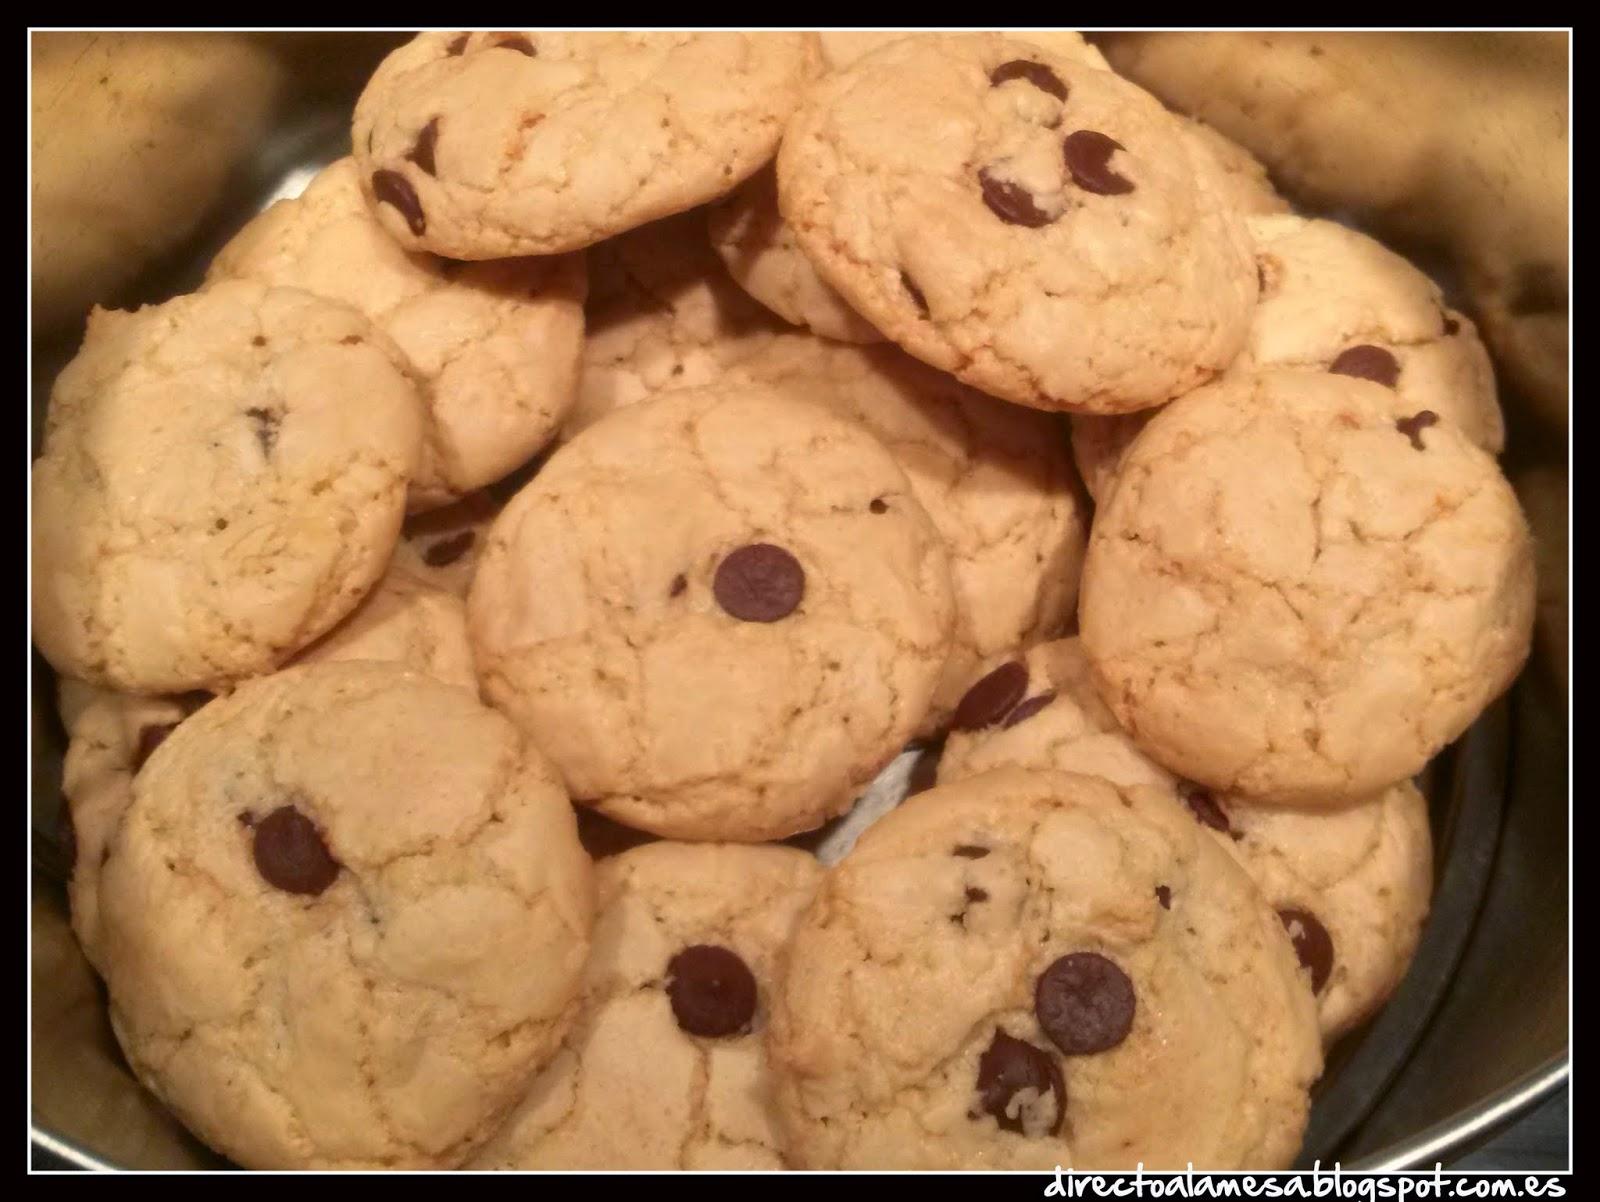 http://directoalamesa.blogspot.com.es/2014/09/galletas-cookies-paso-paso.html